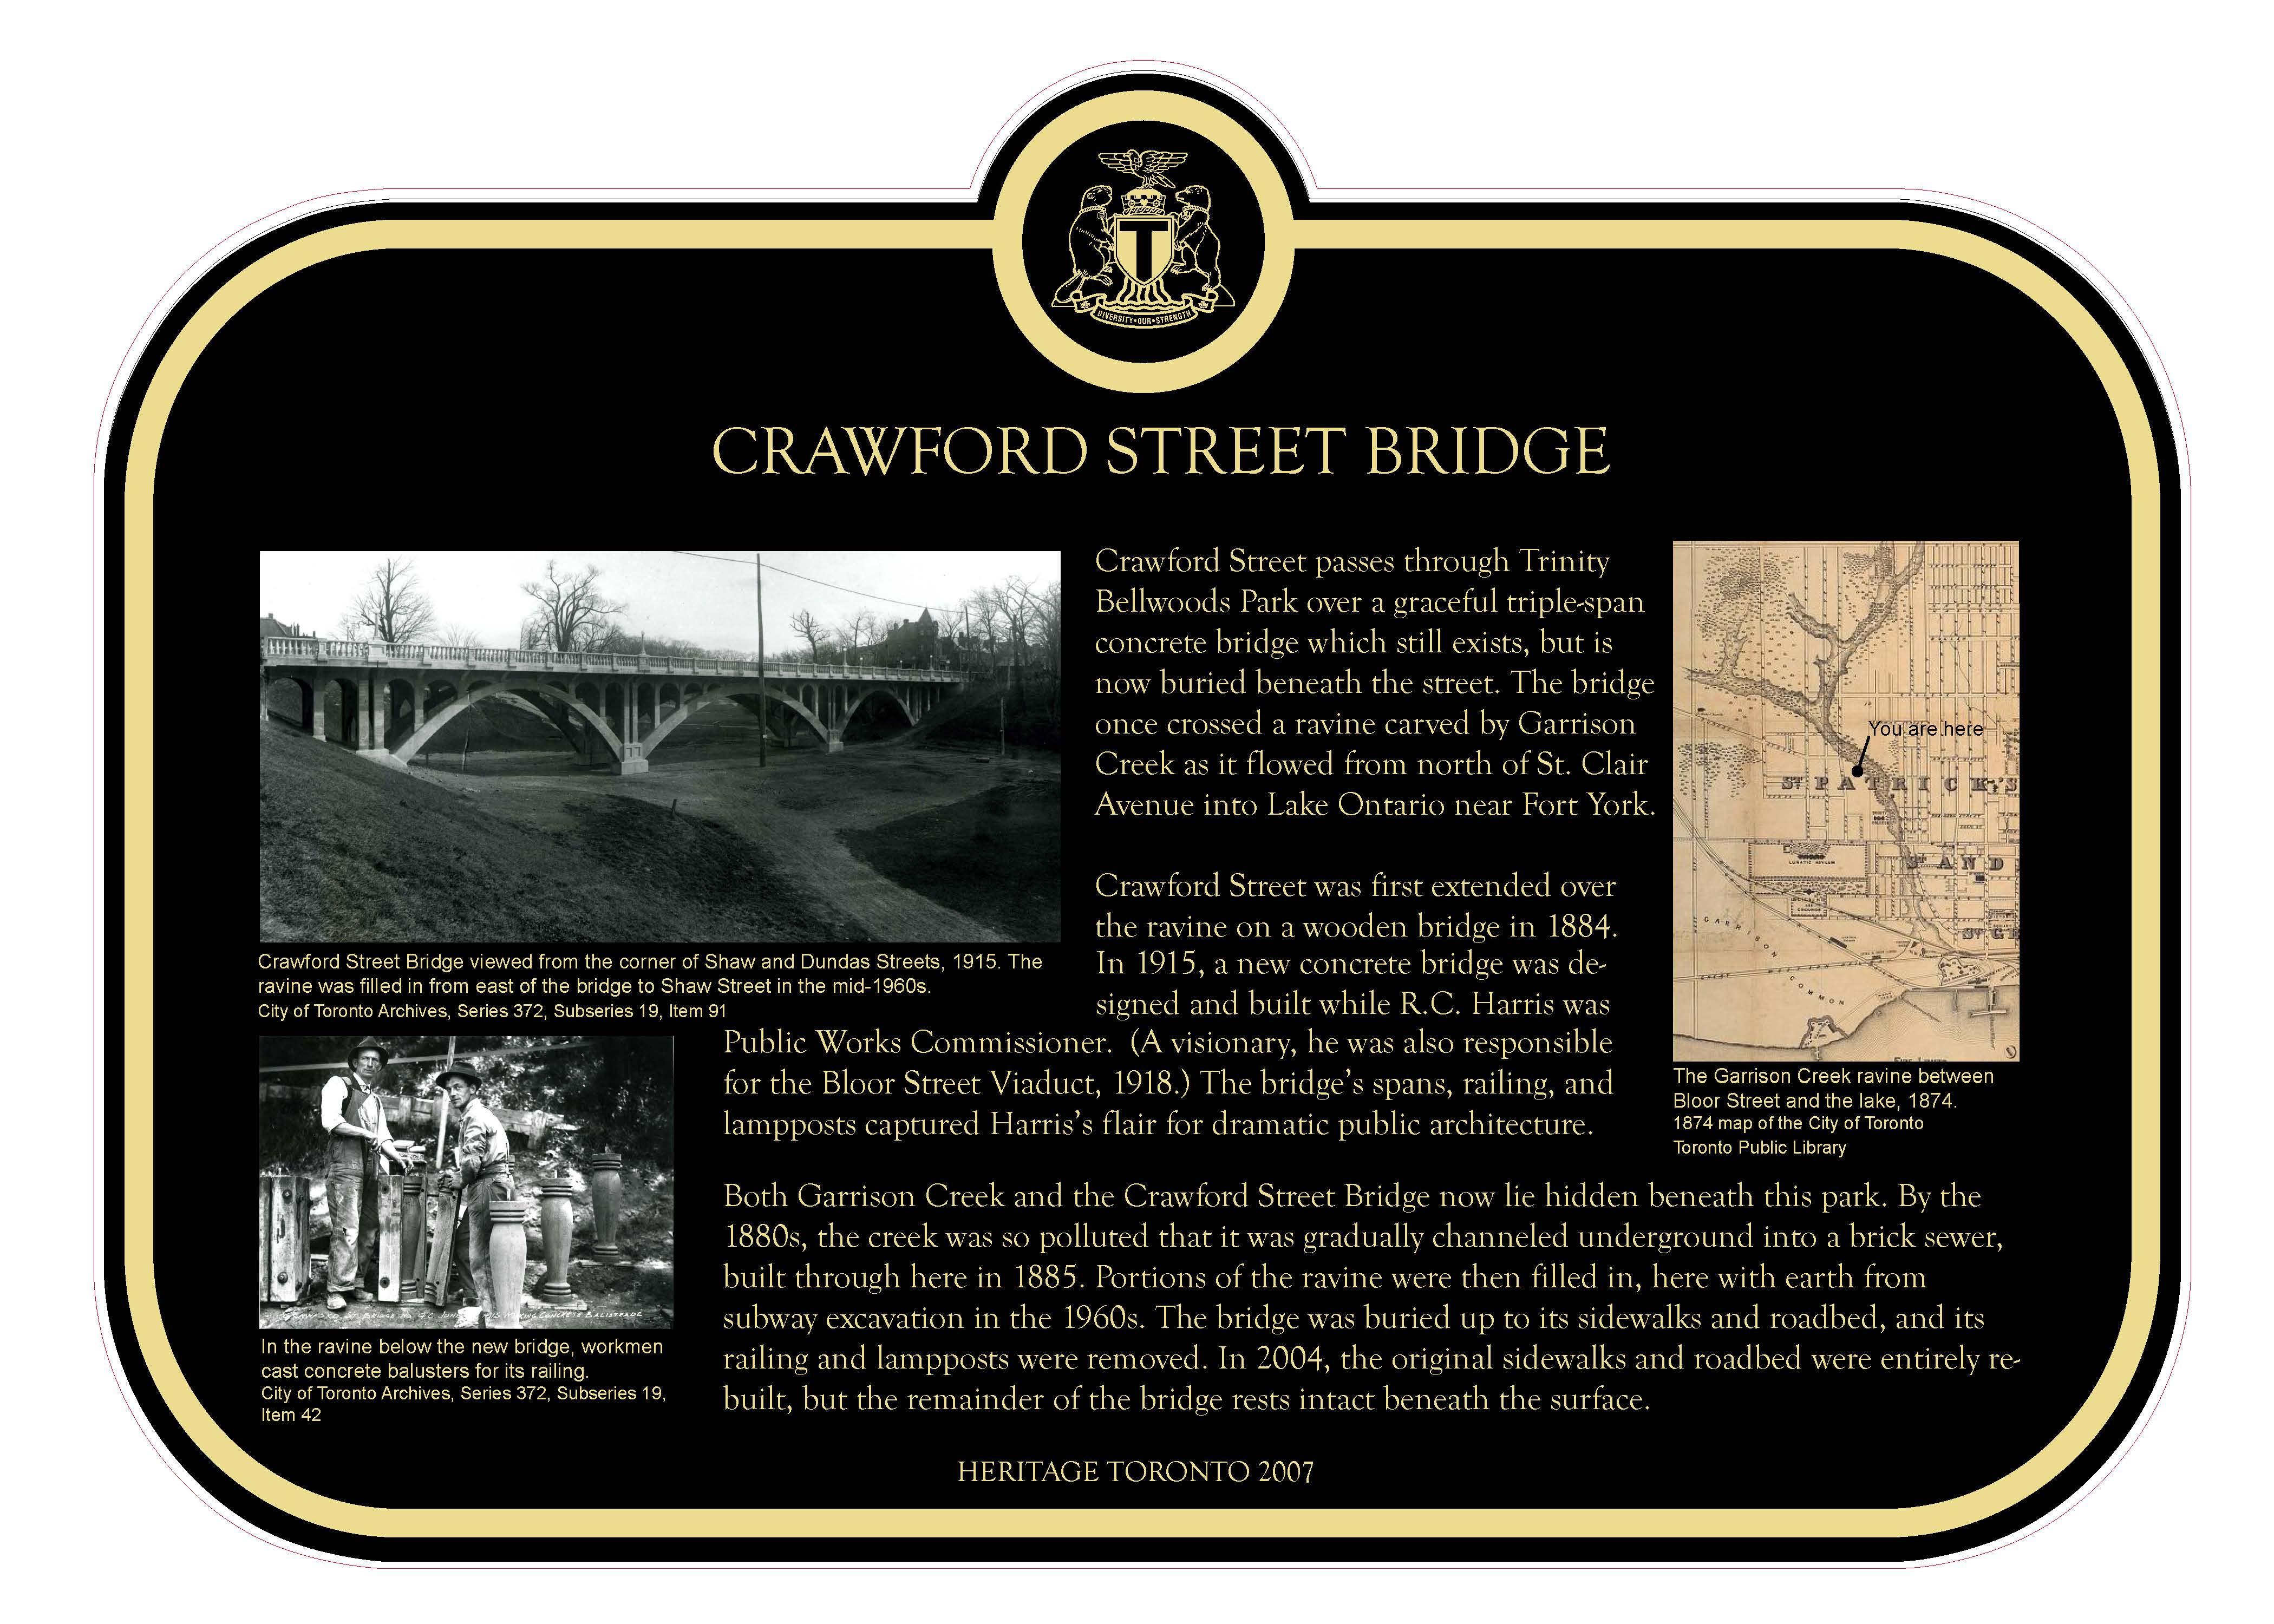 Crawford Street Bridge From Heritage Toronto